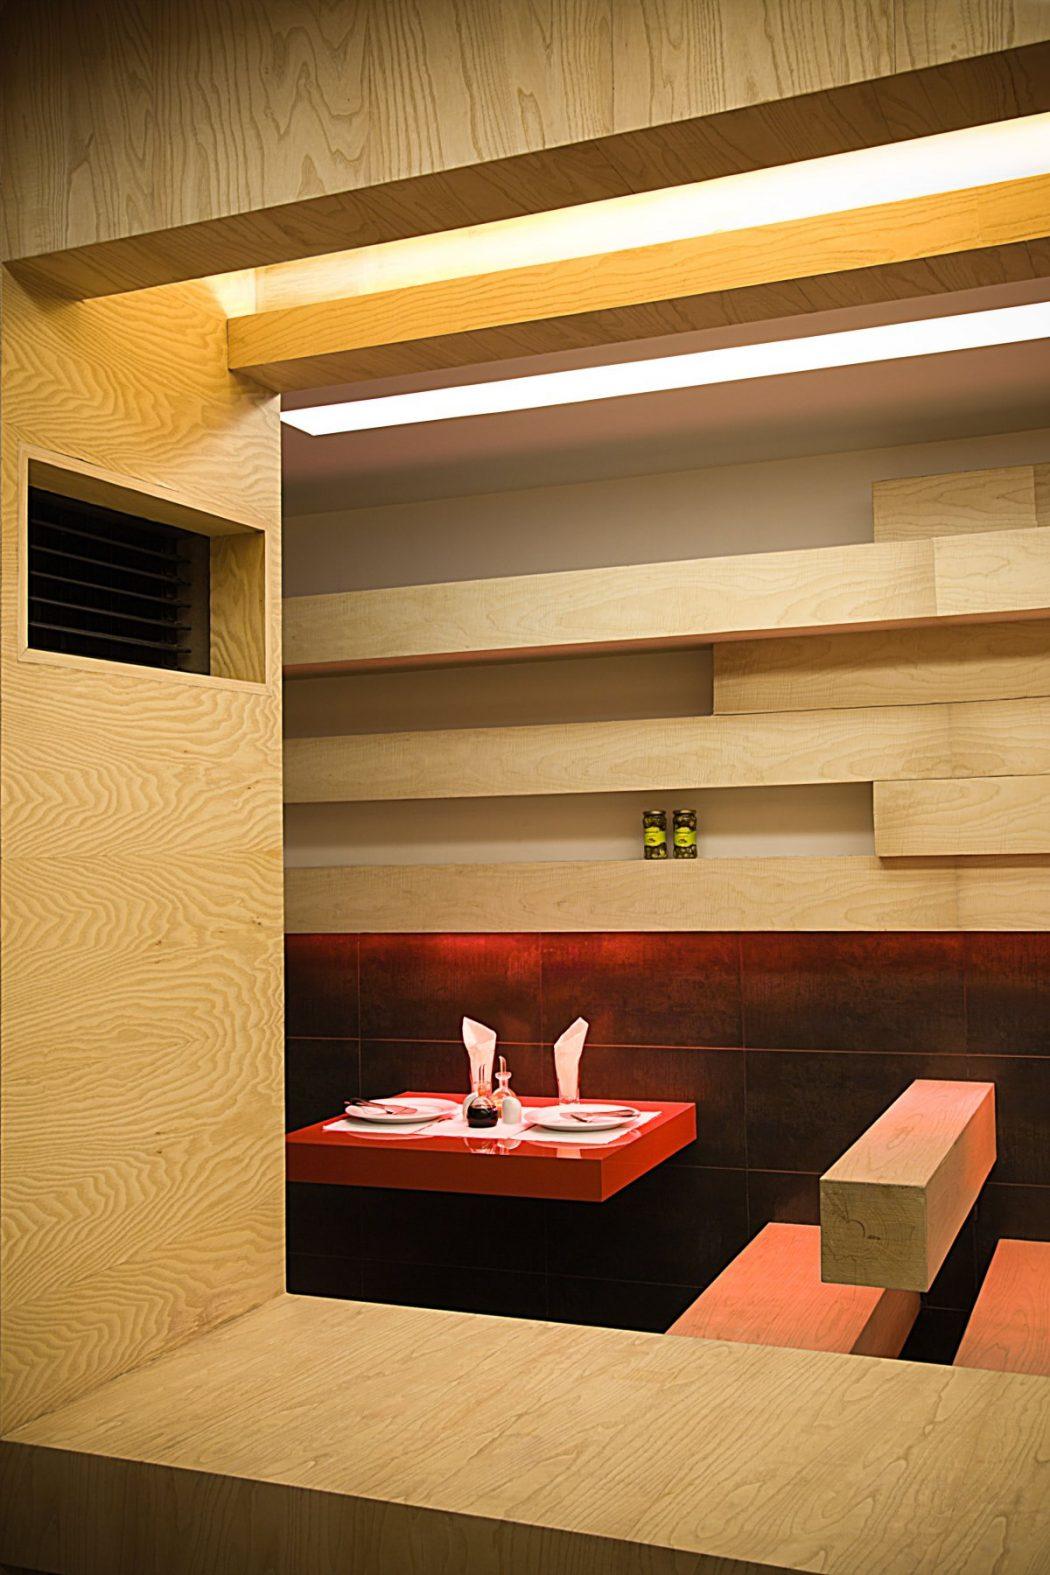 Modern-Interior-Ator-Restaurant-Interior-Design 15 Innovative Interior Designs for Restaurants